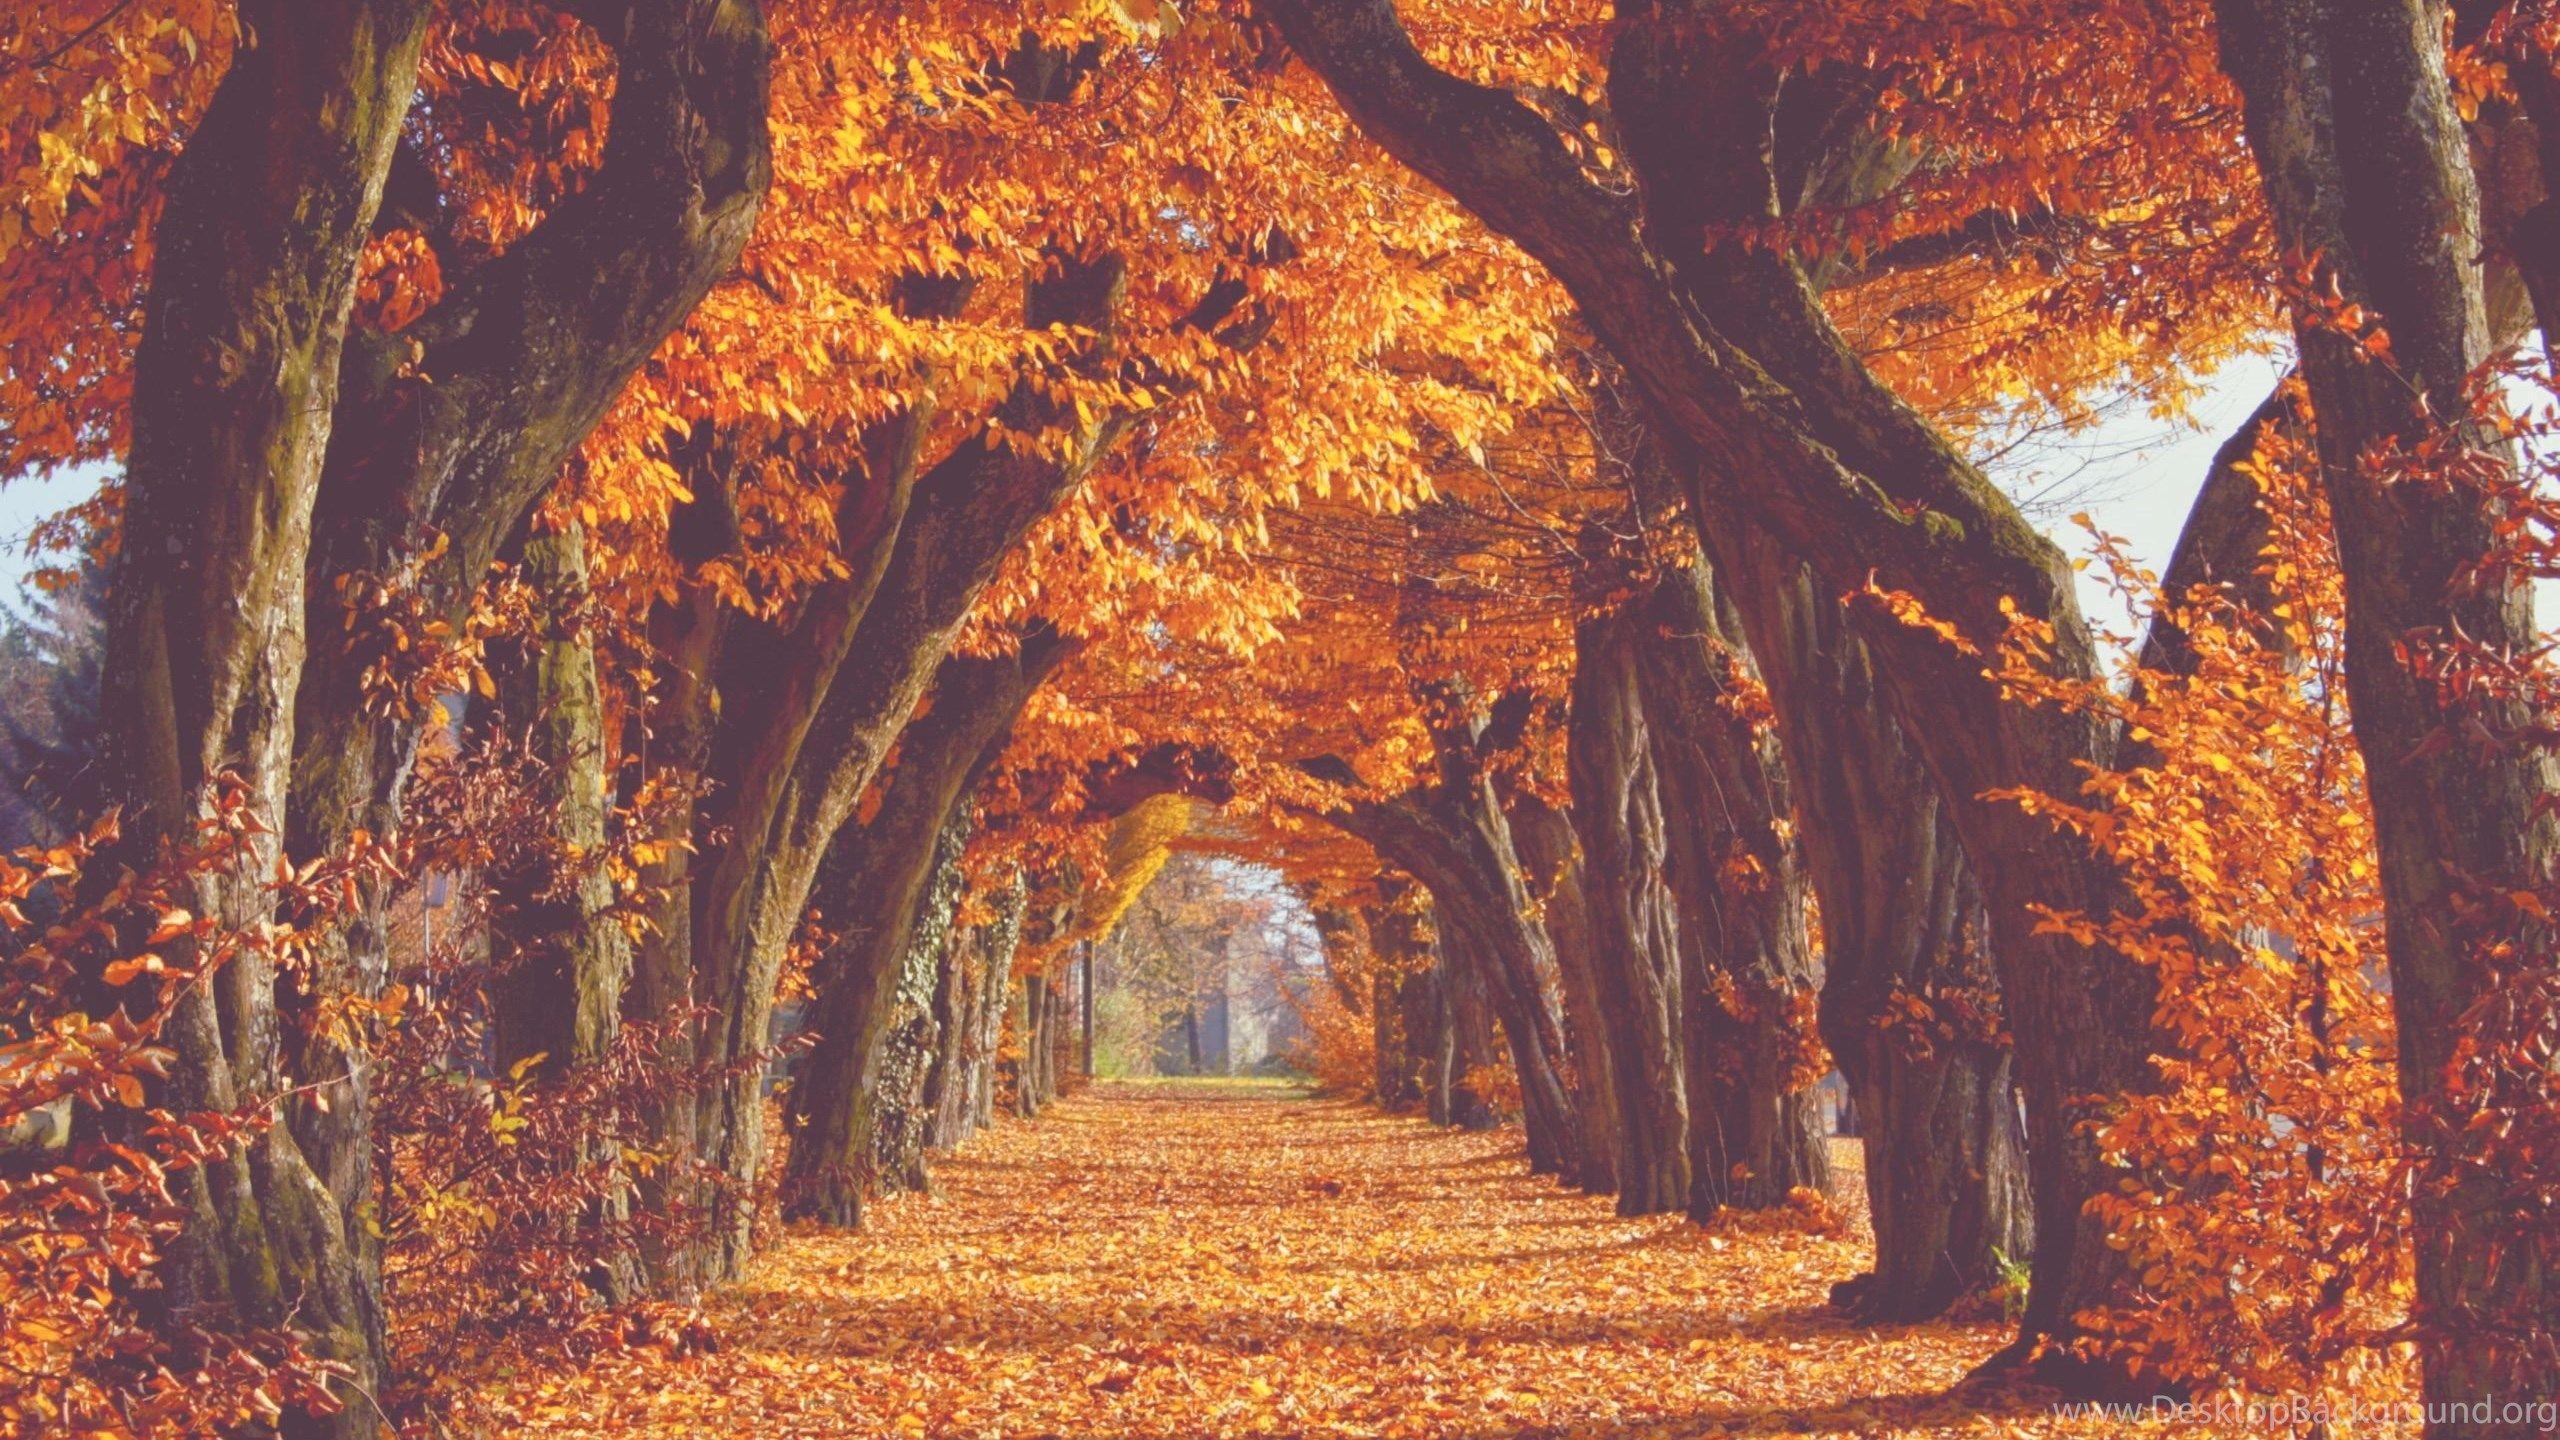 Tumblr Autumn Desktop Wallpapers - Top Free Tumblr Autumn ...